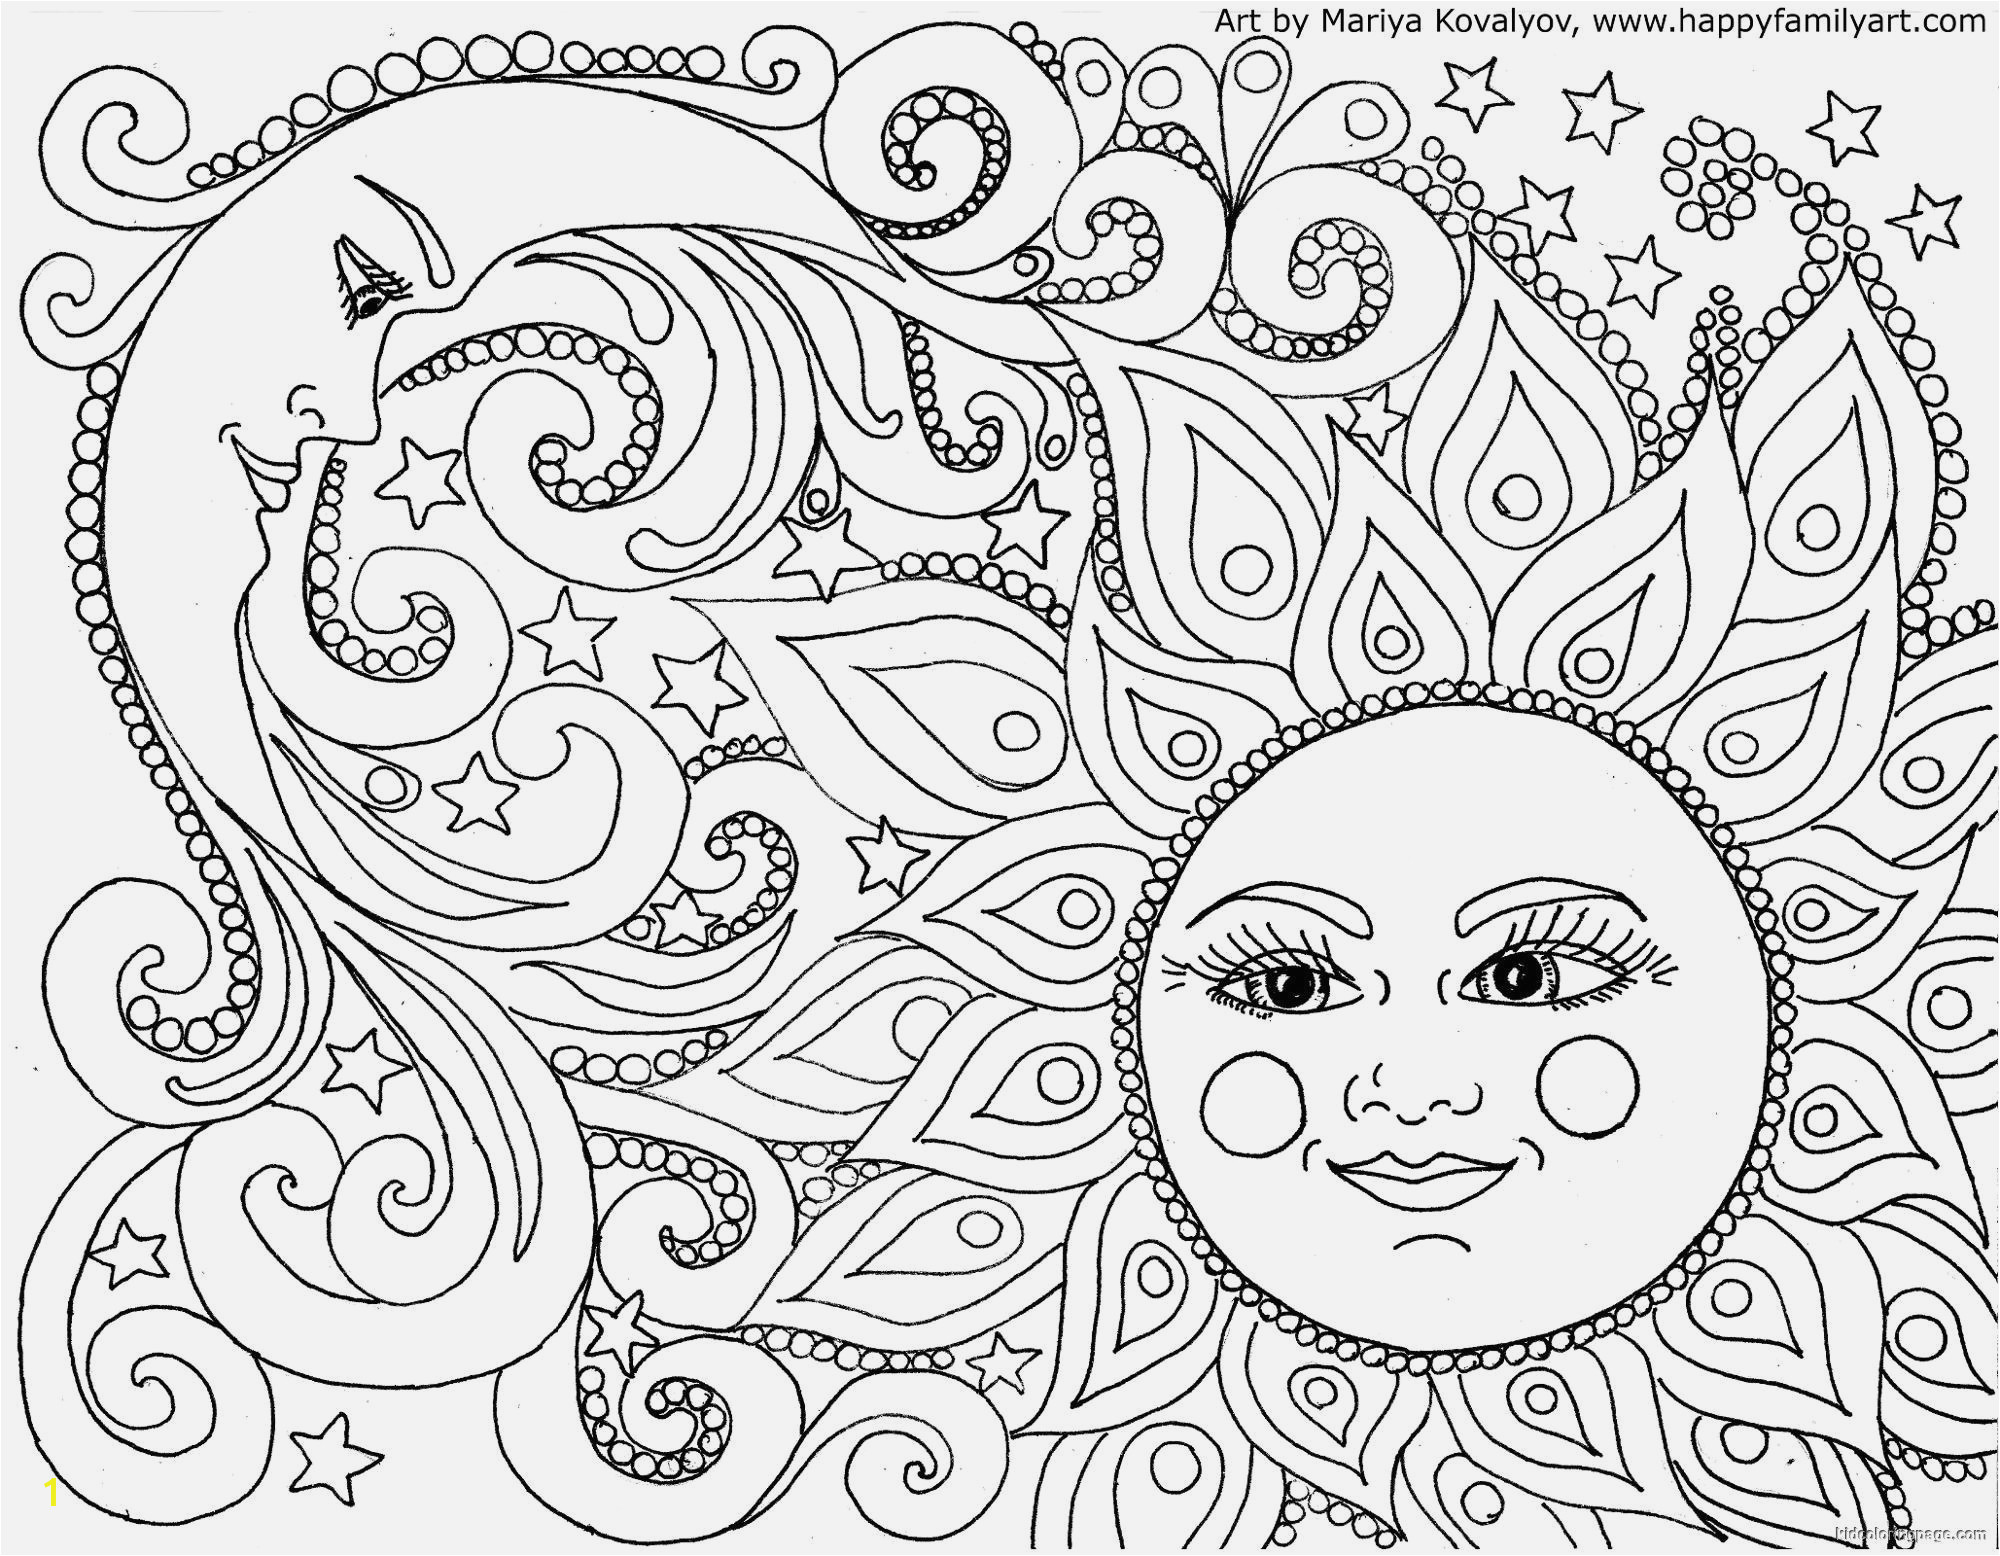 Sun Coloring Page Free Print Luxury Pokemon Sun and Moon Coloring Pages Sun Coloring Page